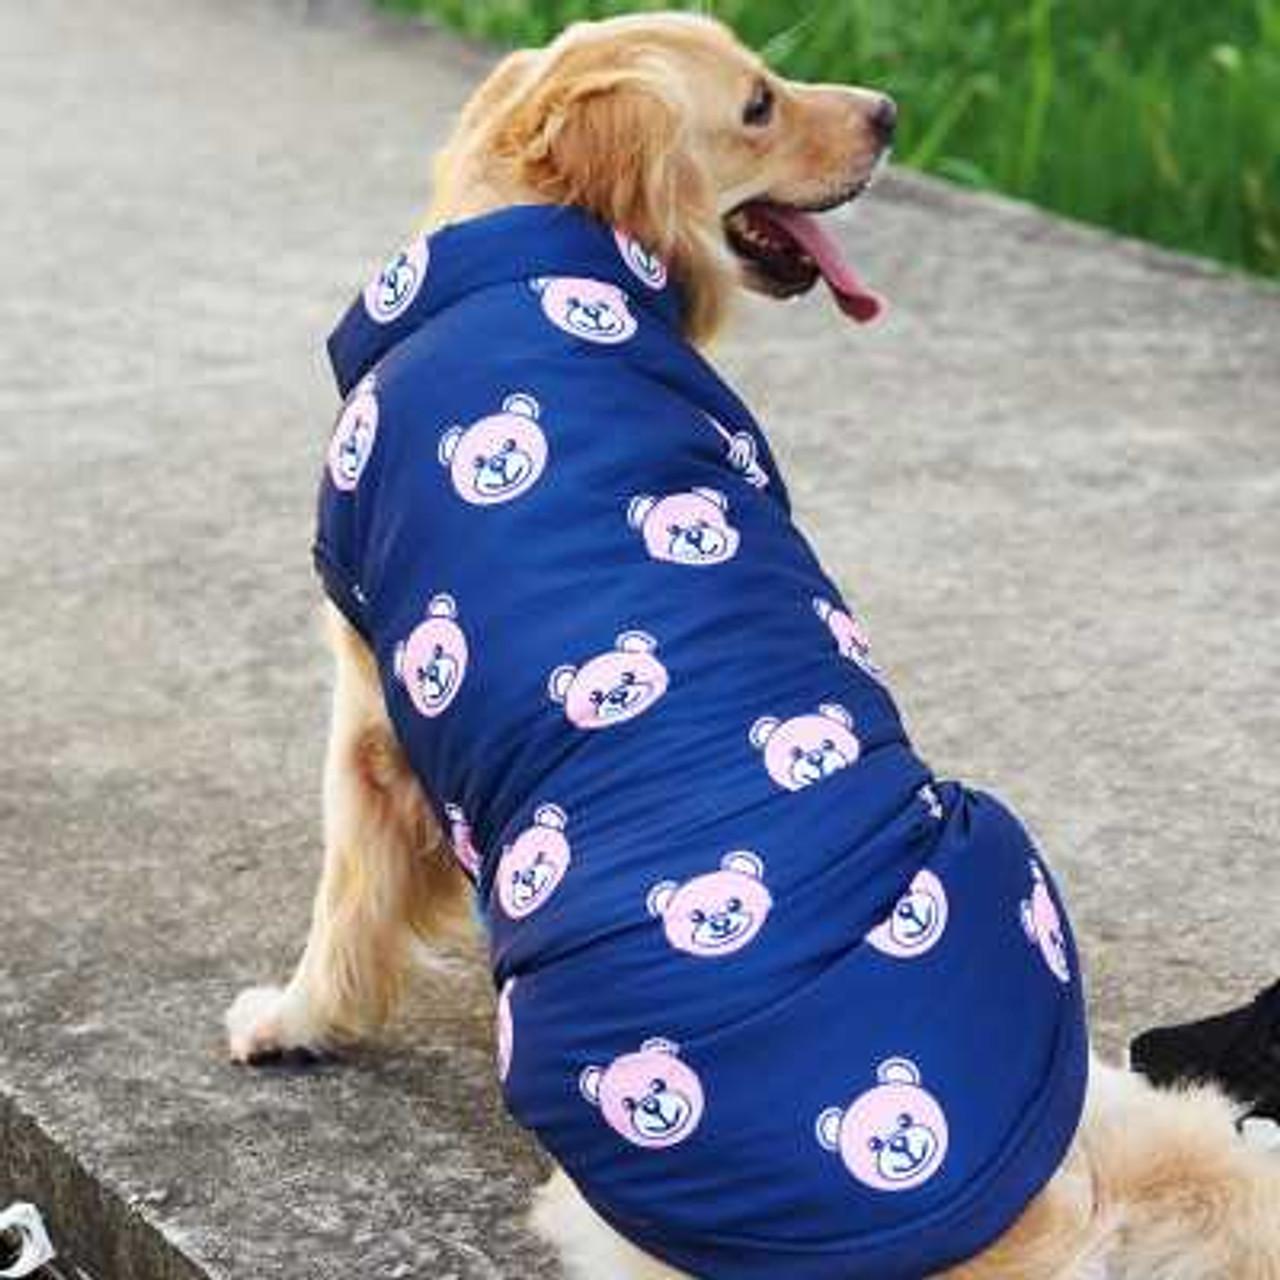 9a4266fb3bc6 Winter Warm Big Large Dog Pet Clothes Golden Retriever Dog Cotton Padded  Jacket Coat